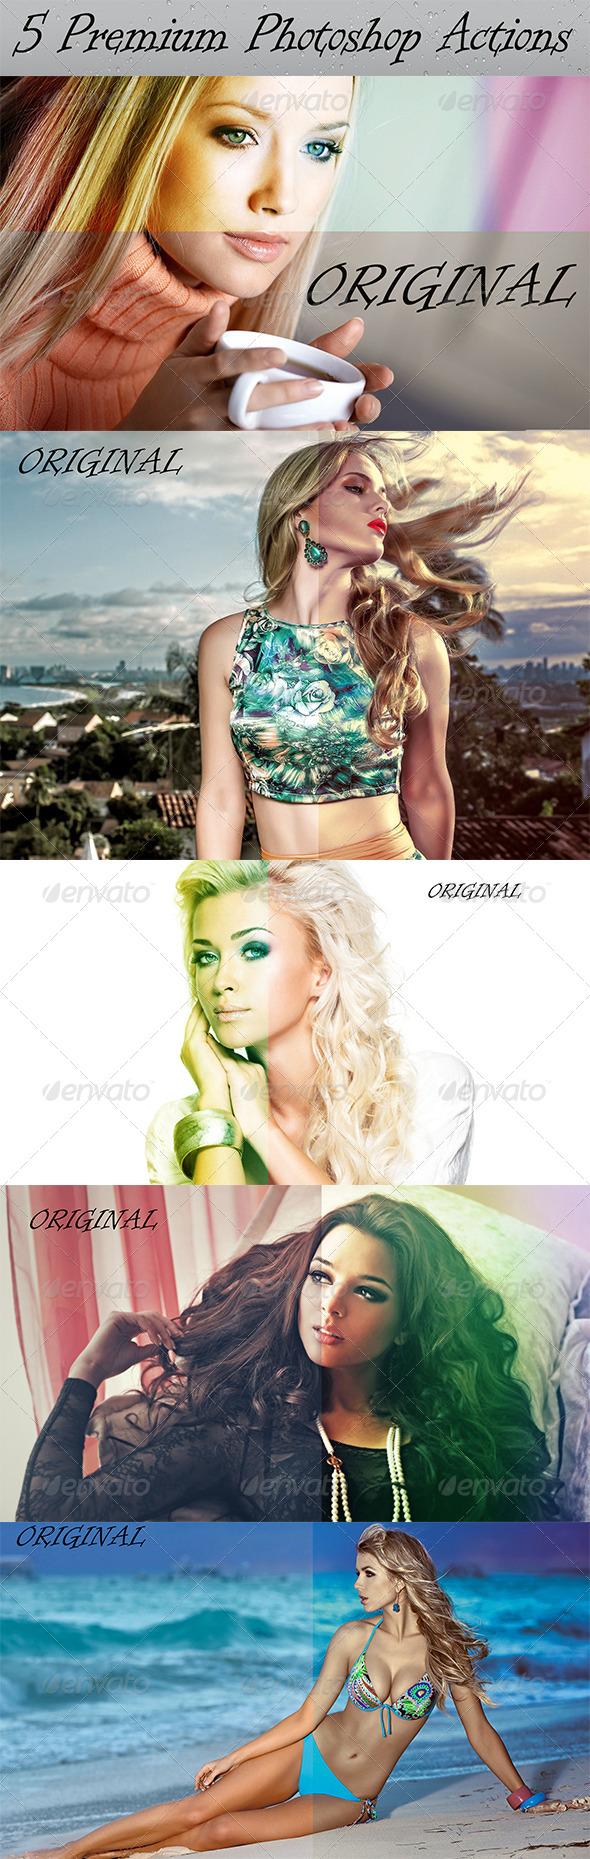 GraphicRiver 5 Premium Photoshop Actions 8550512